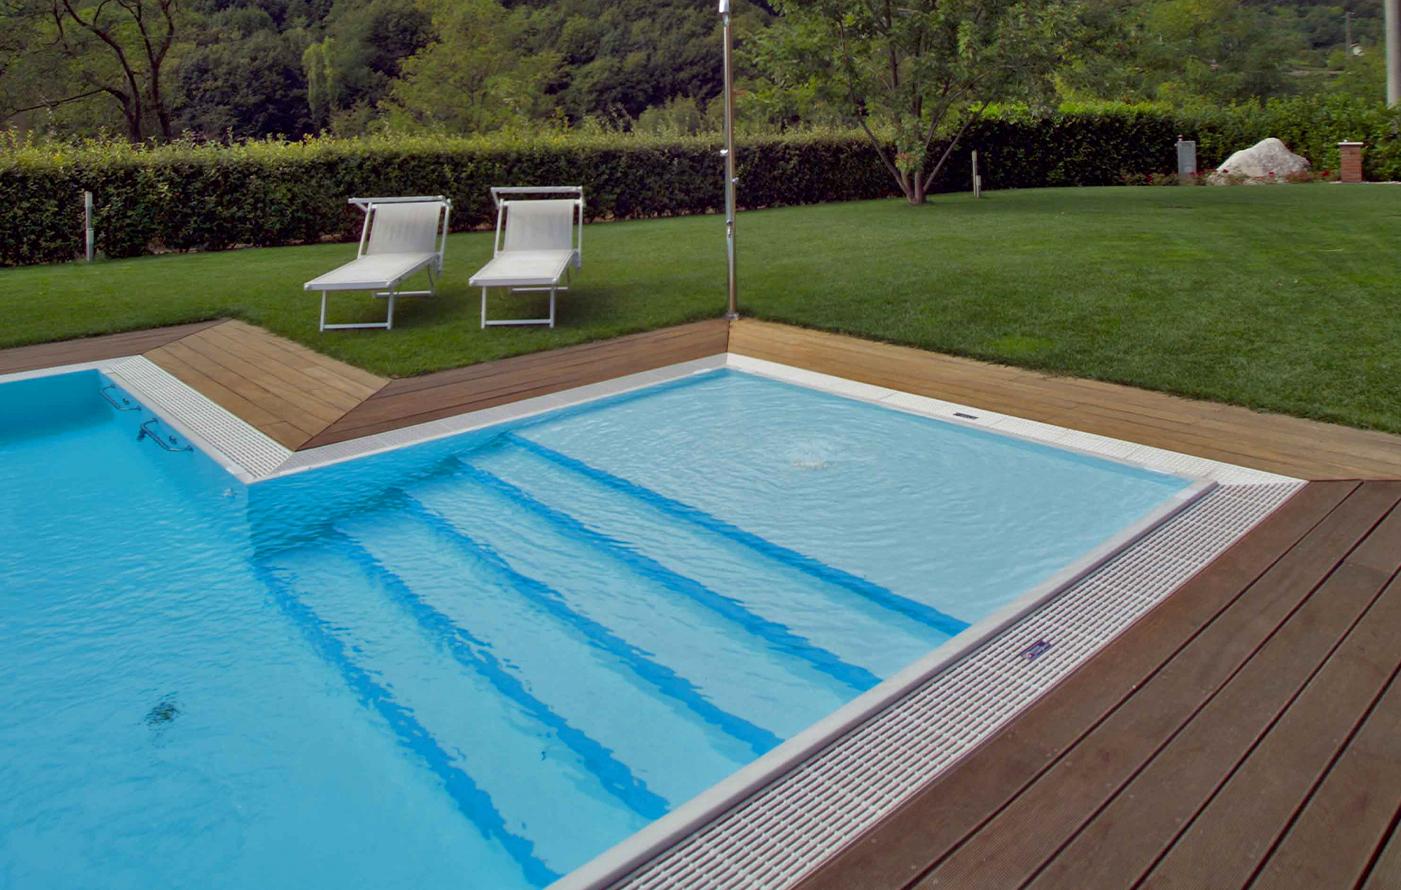 agriverde-scala-recessa-piscina-01